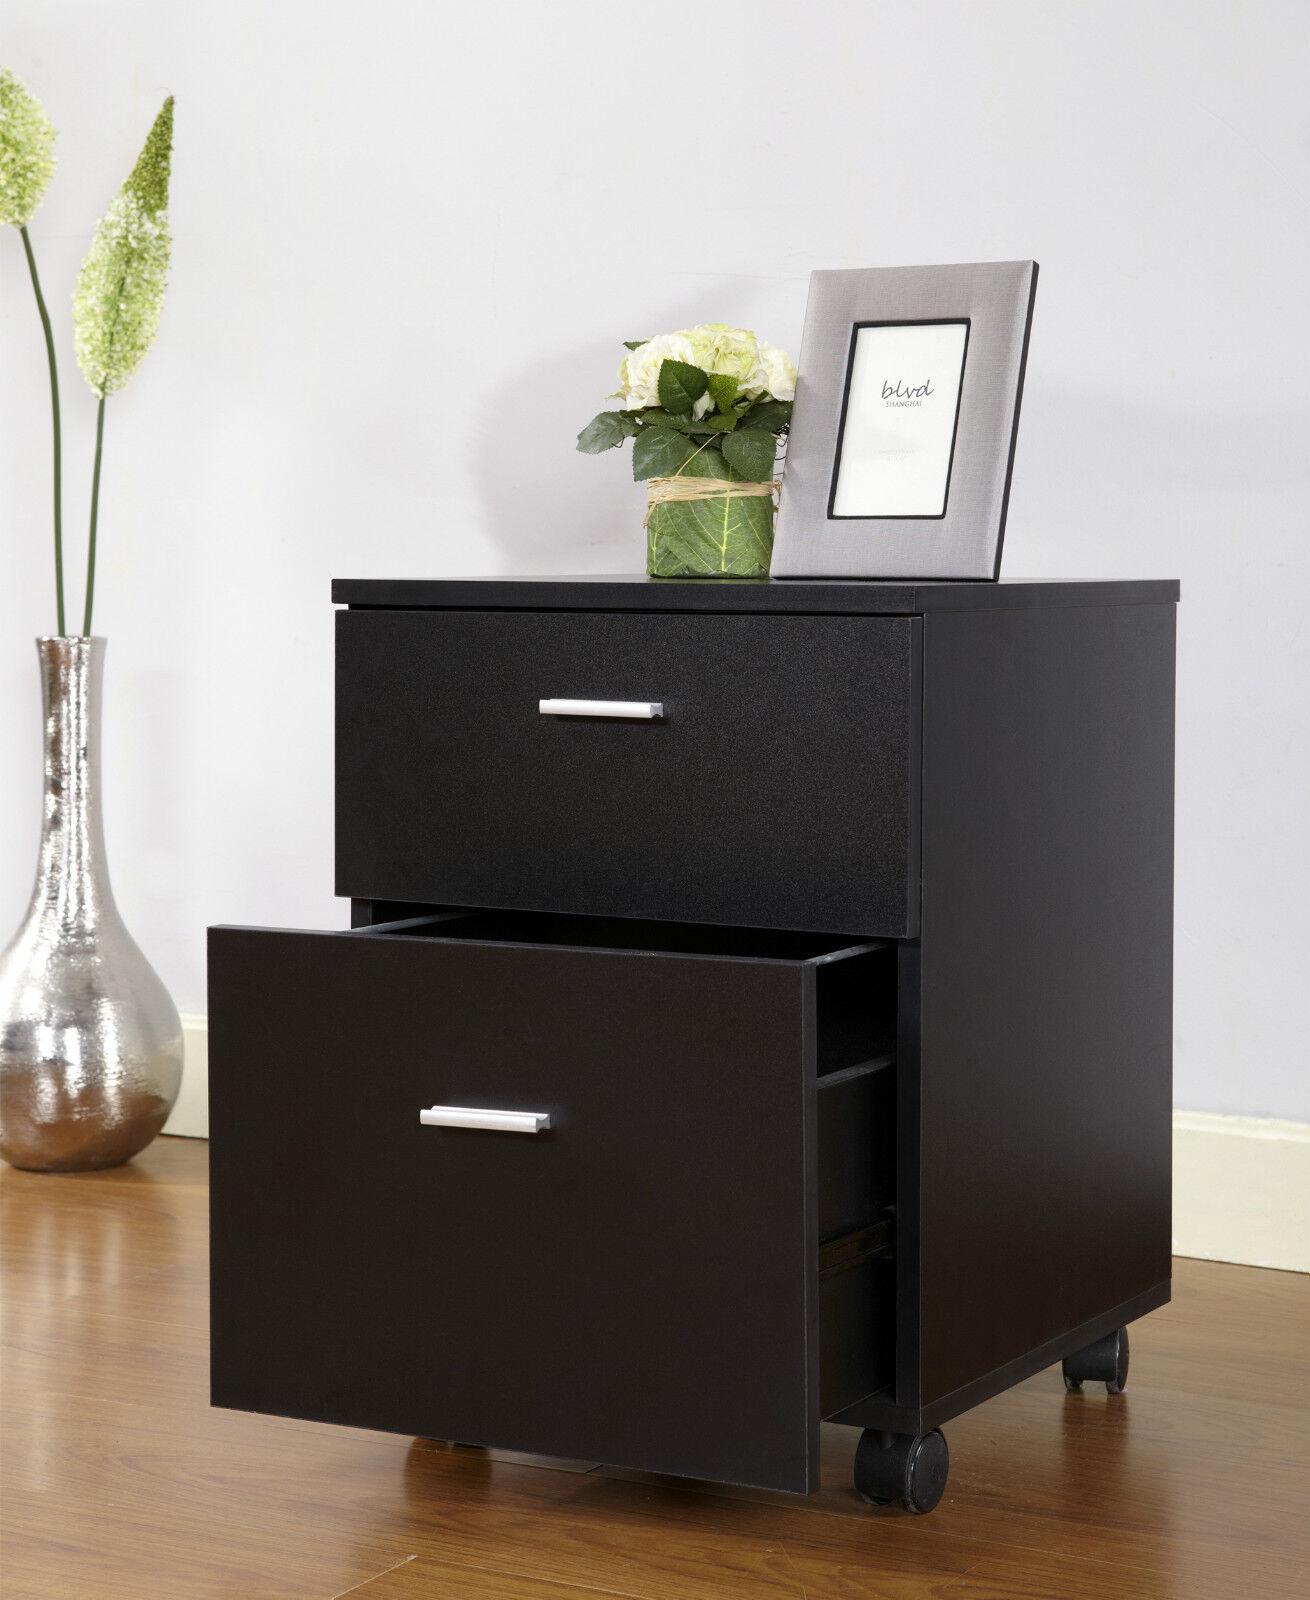 2 Drawer Wood Mobile File Cabinet In Black Finish New Ebay